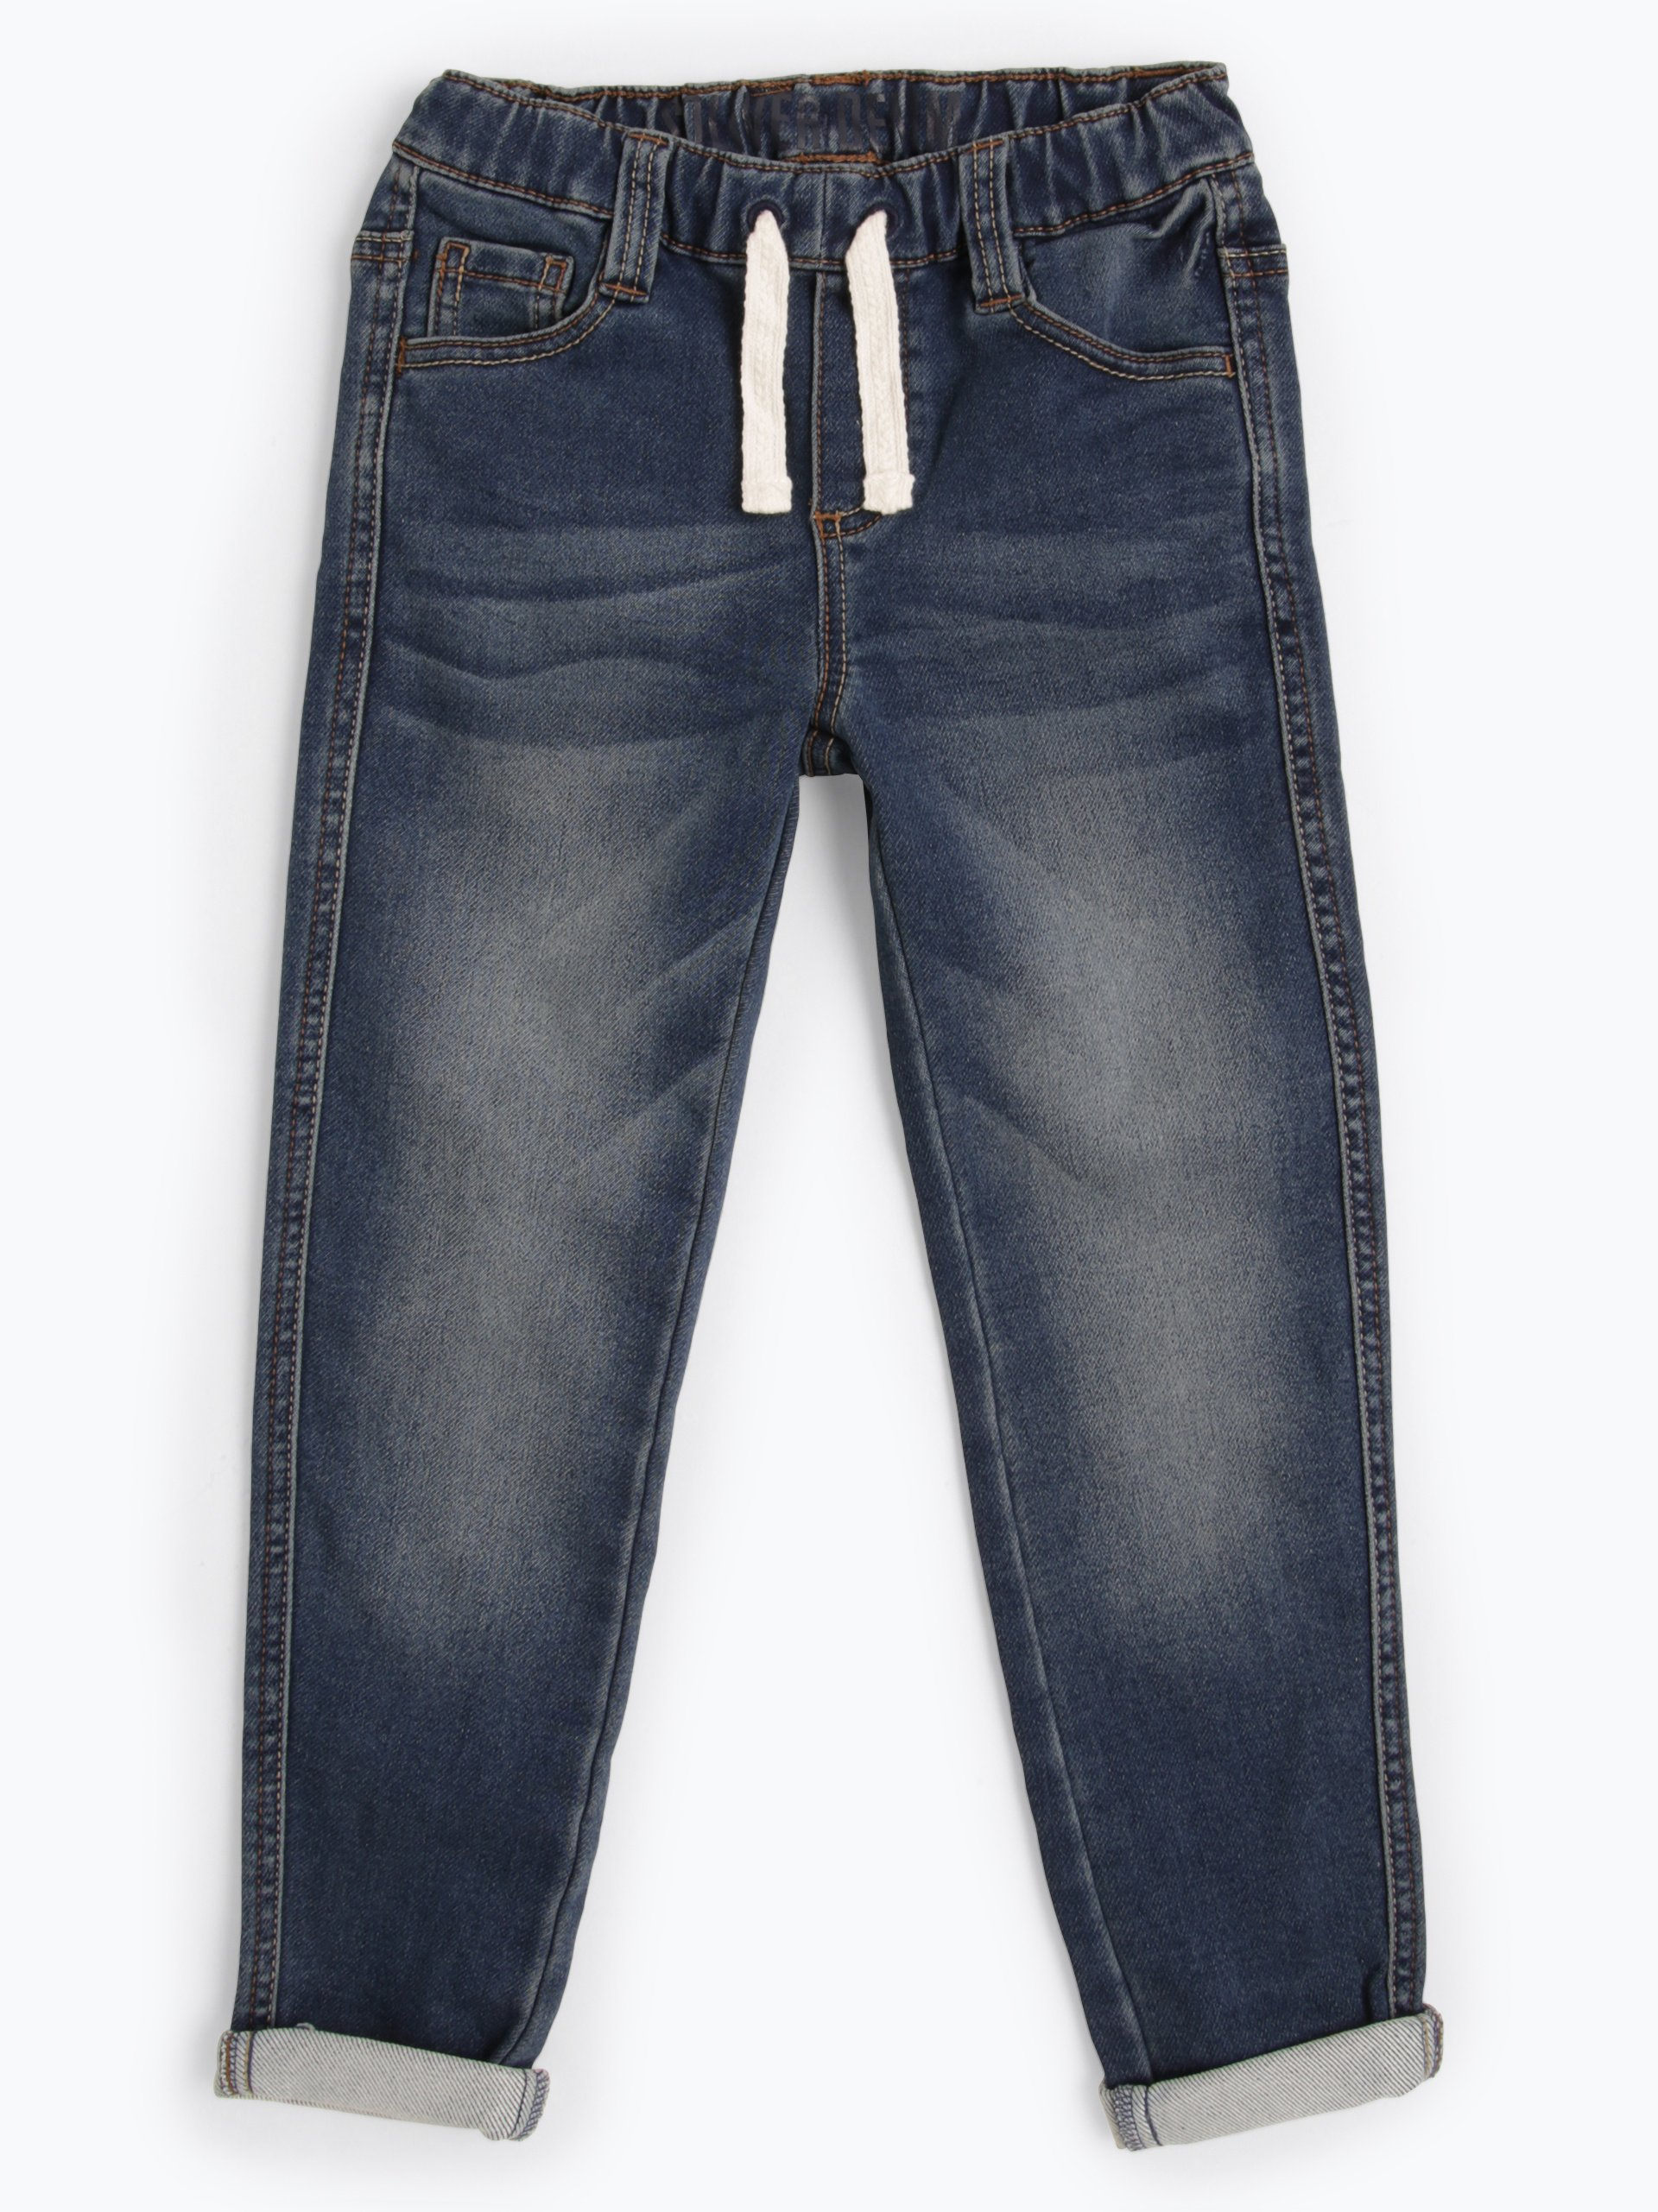 s.Oliver Casual Jungen Jeans